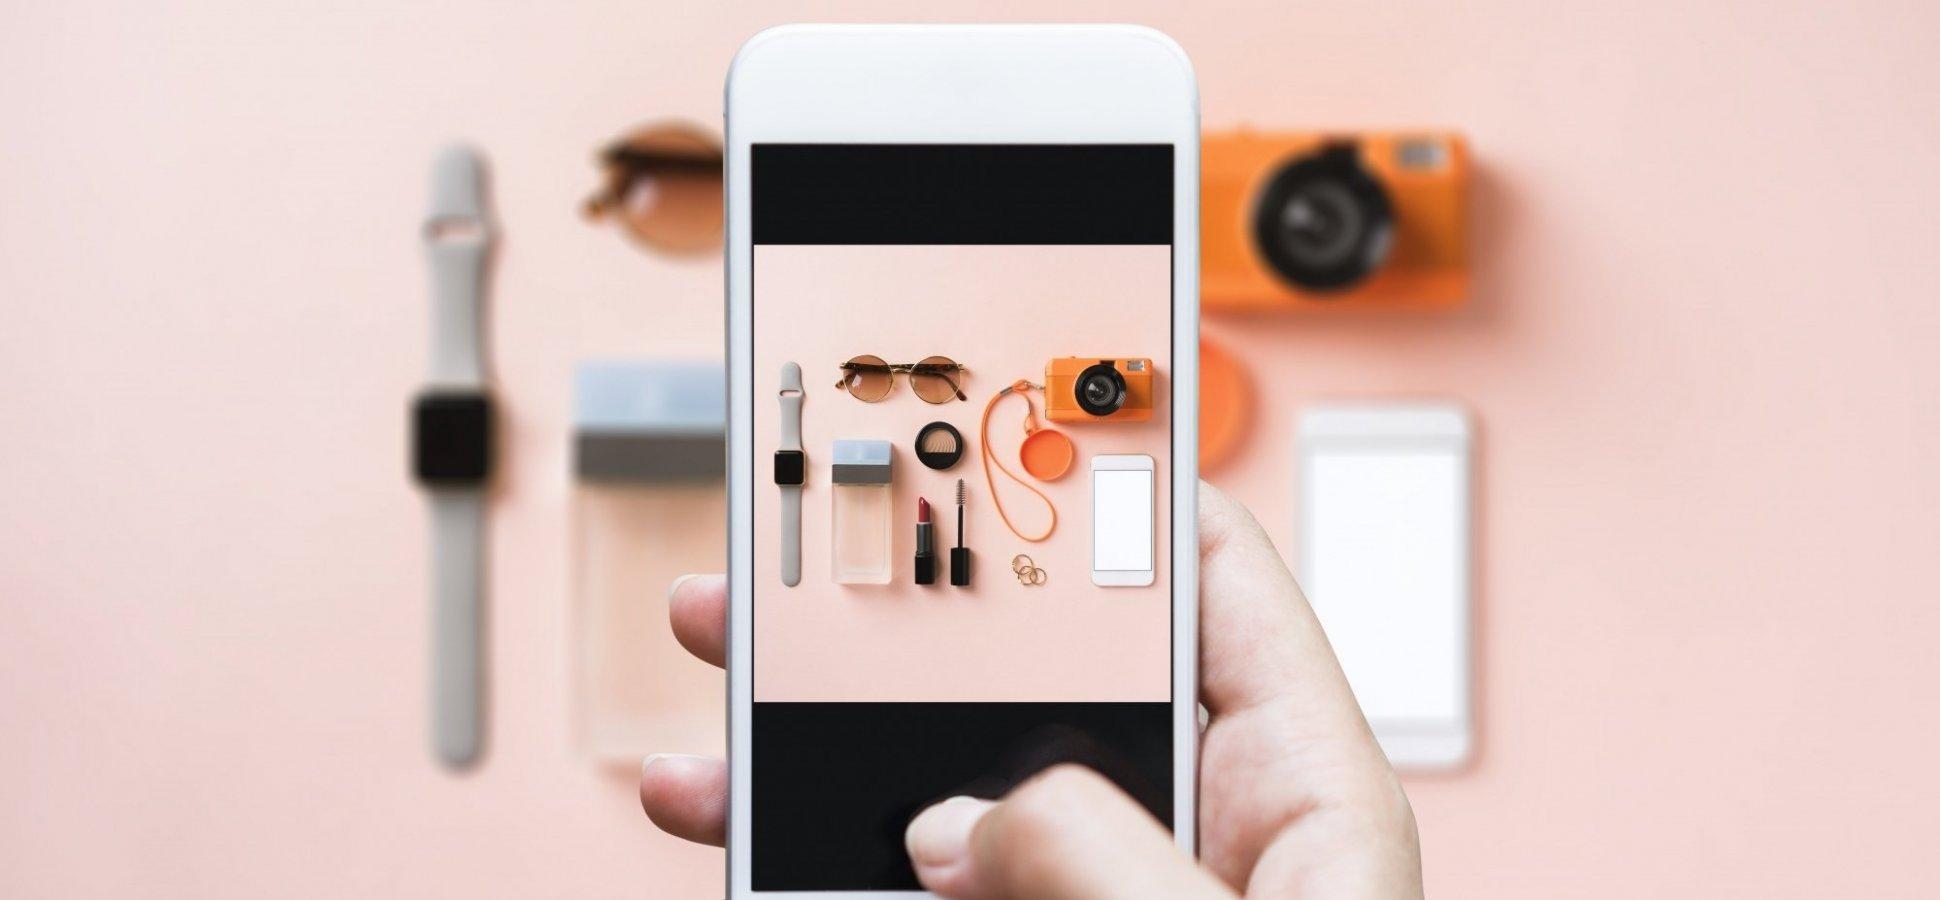 5 Simple Ways to Hack Instagram Marketing